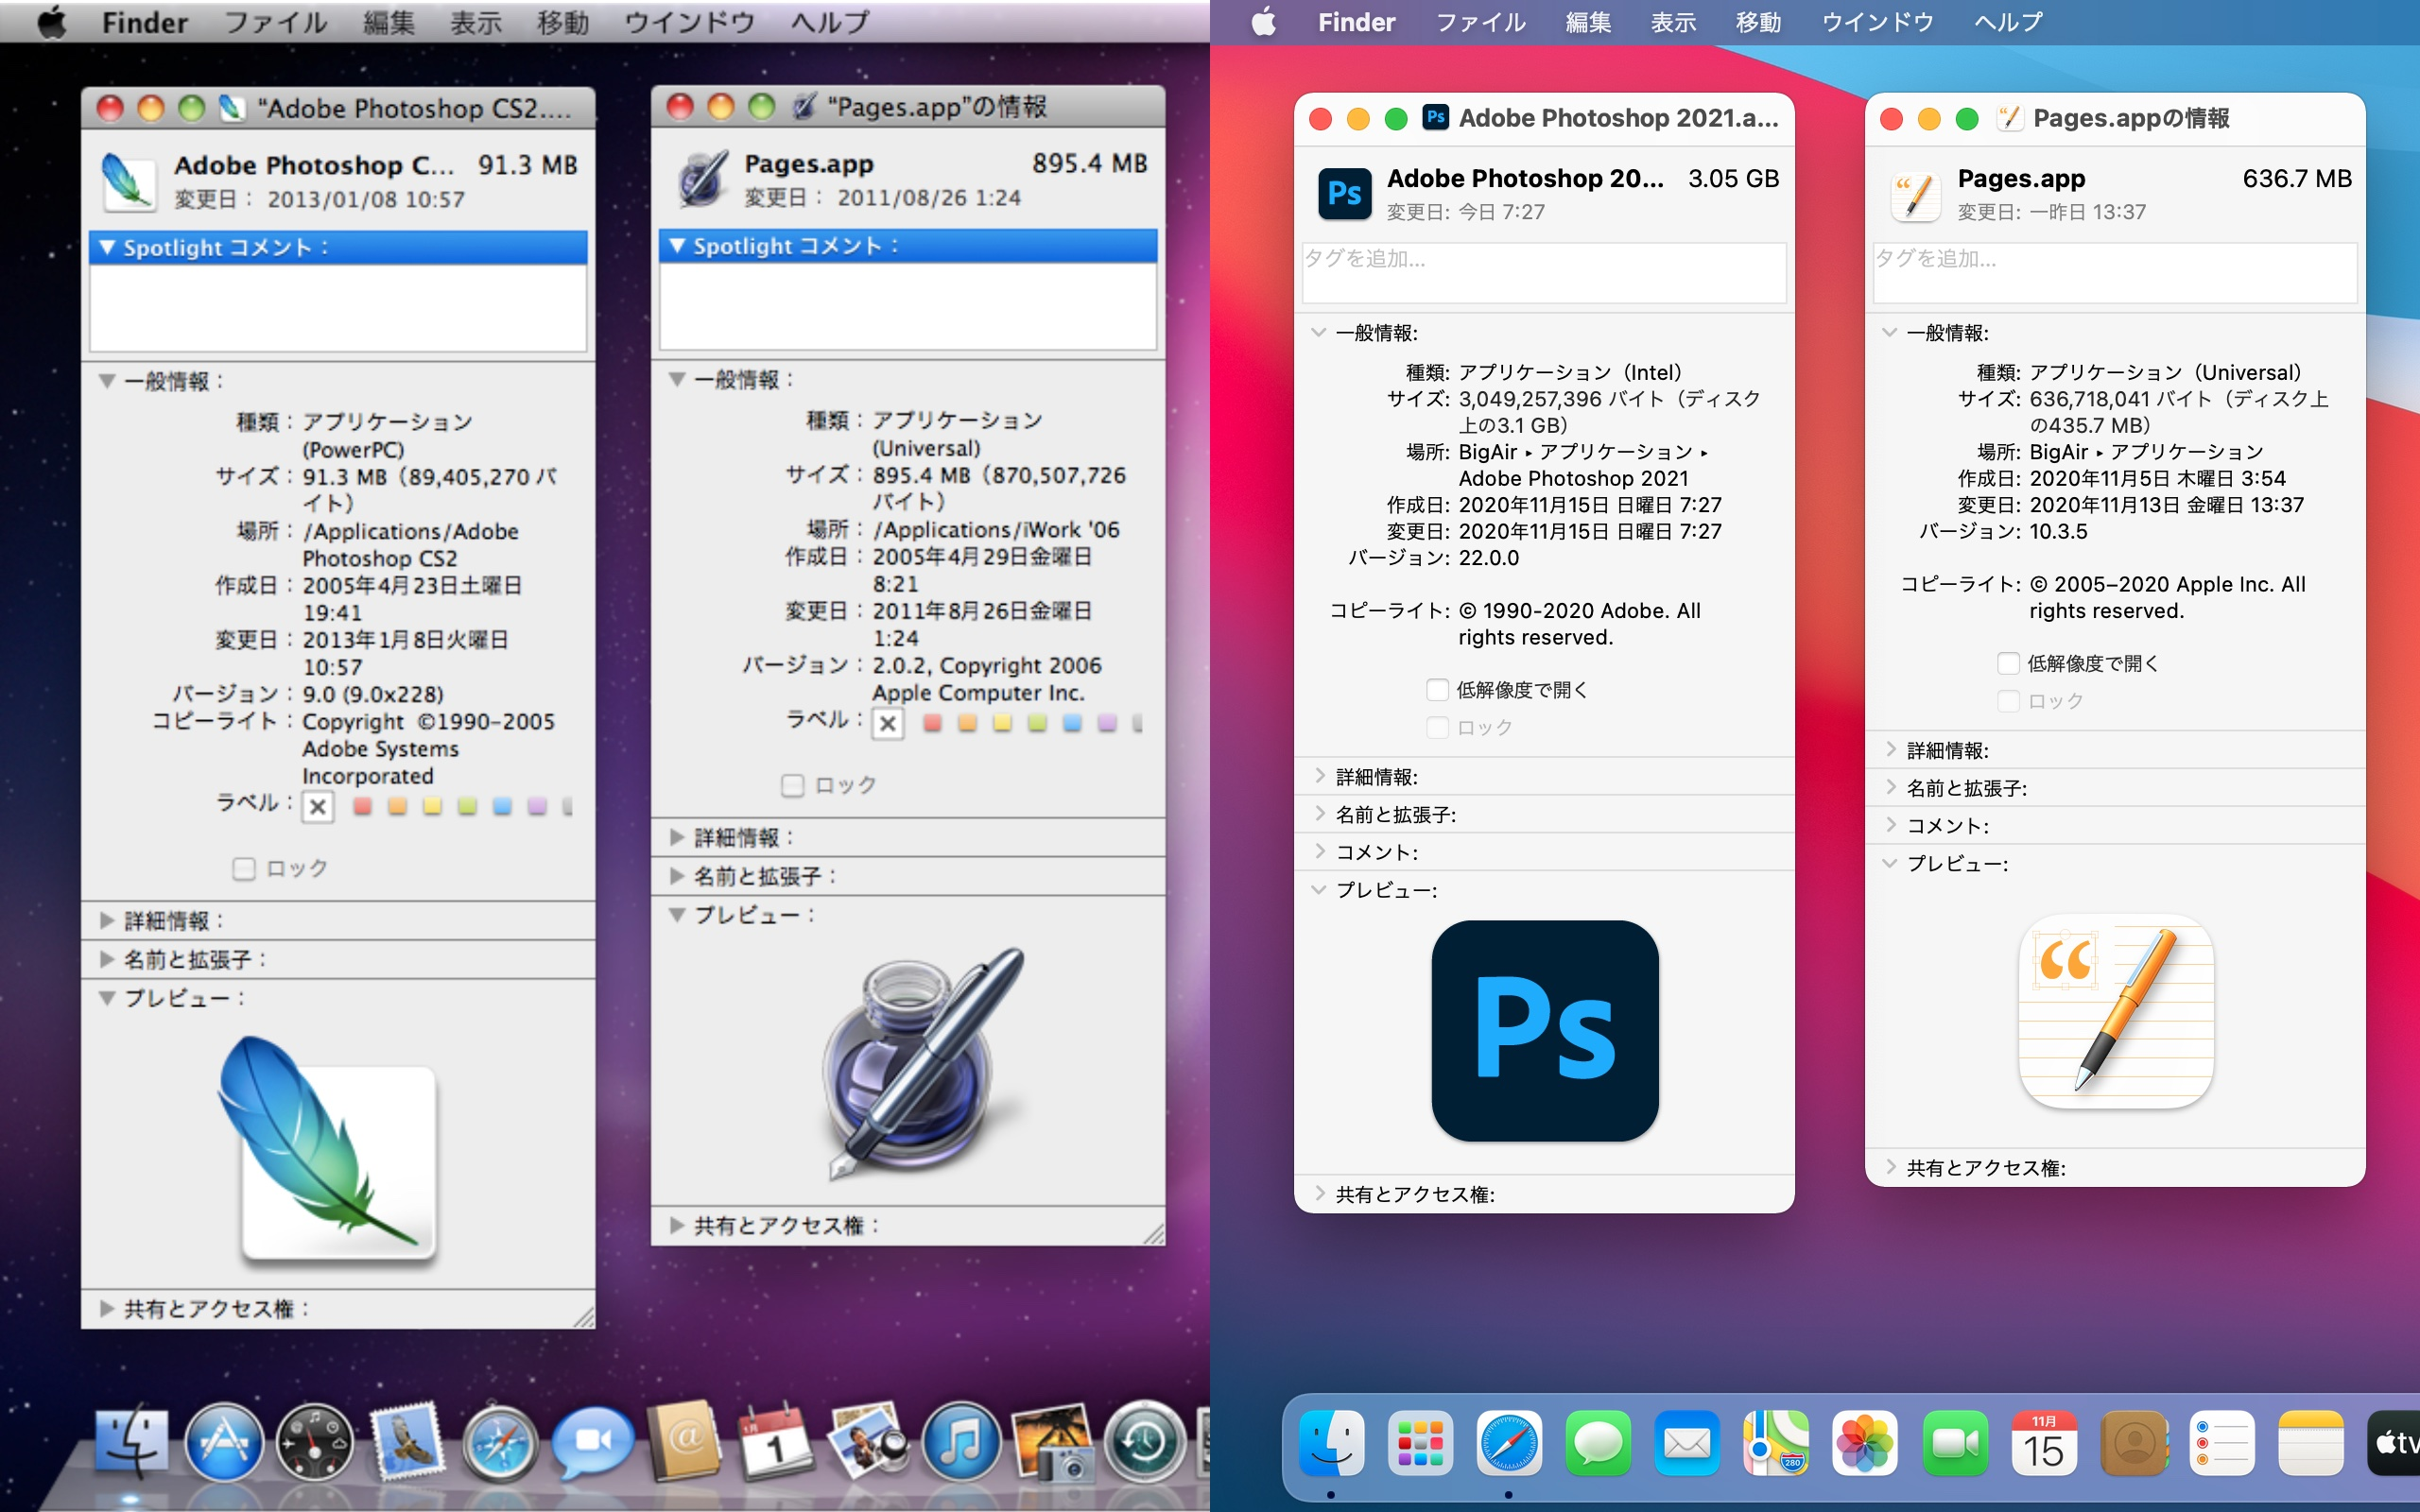 PowerPCとIntelとUniversalアプリ